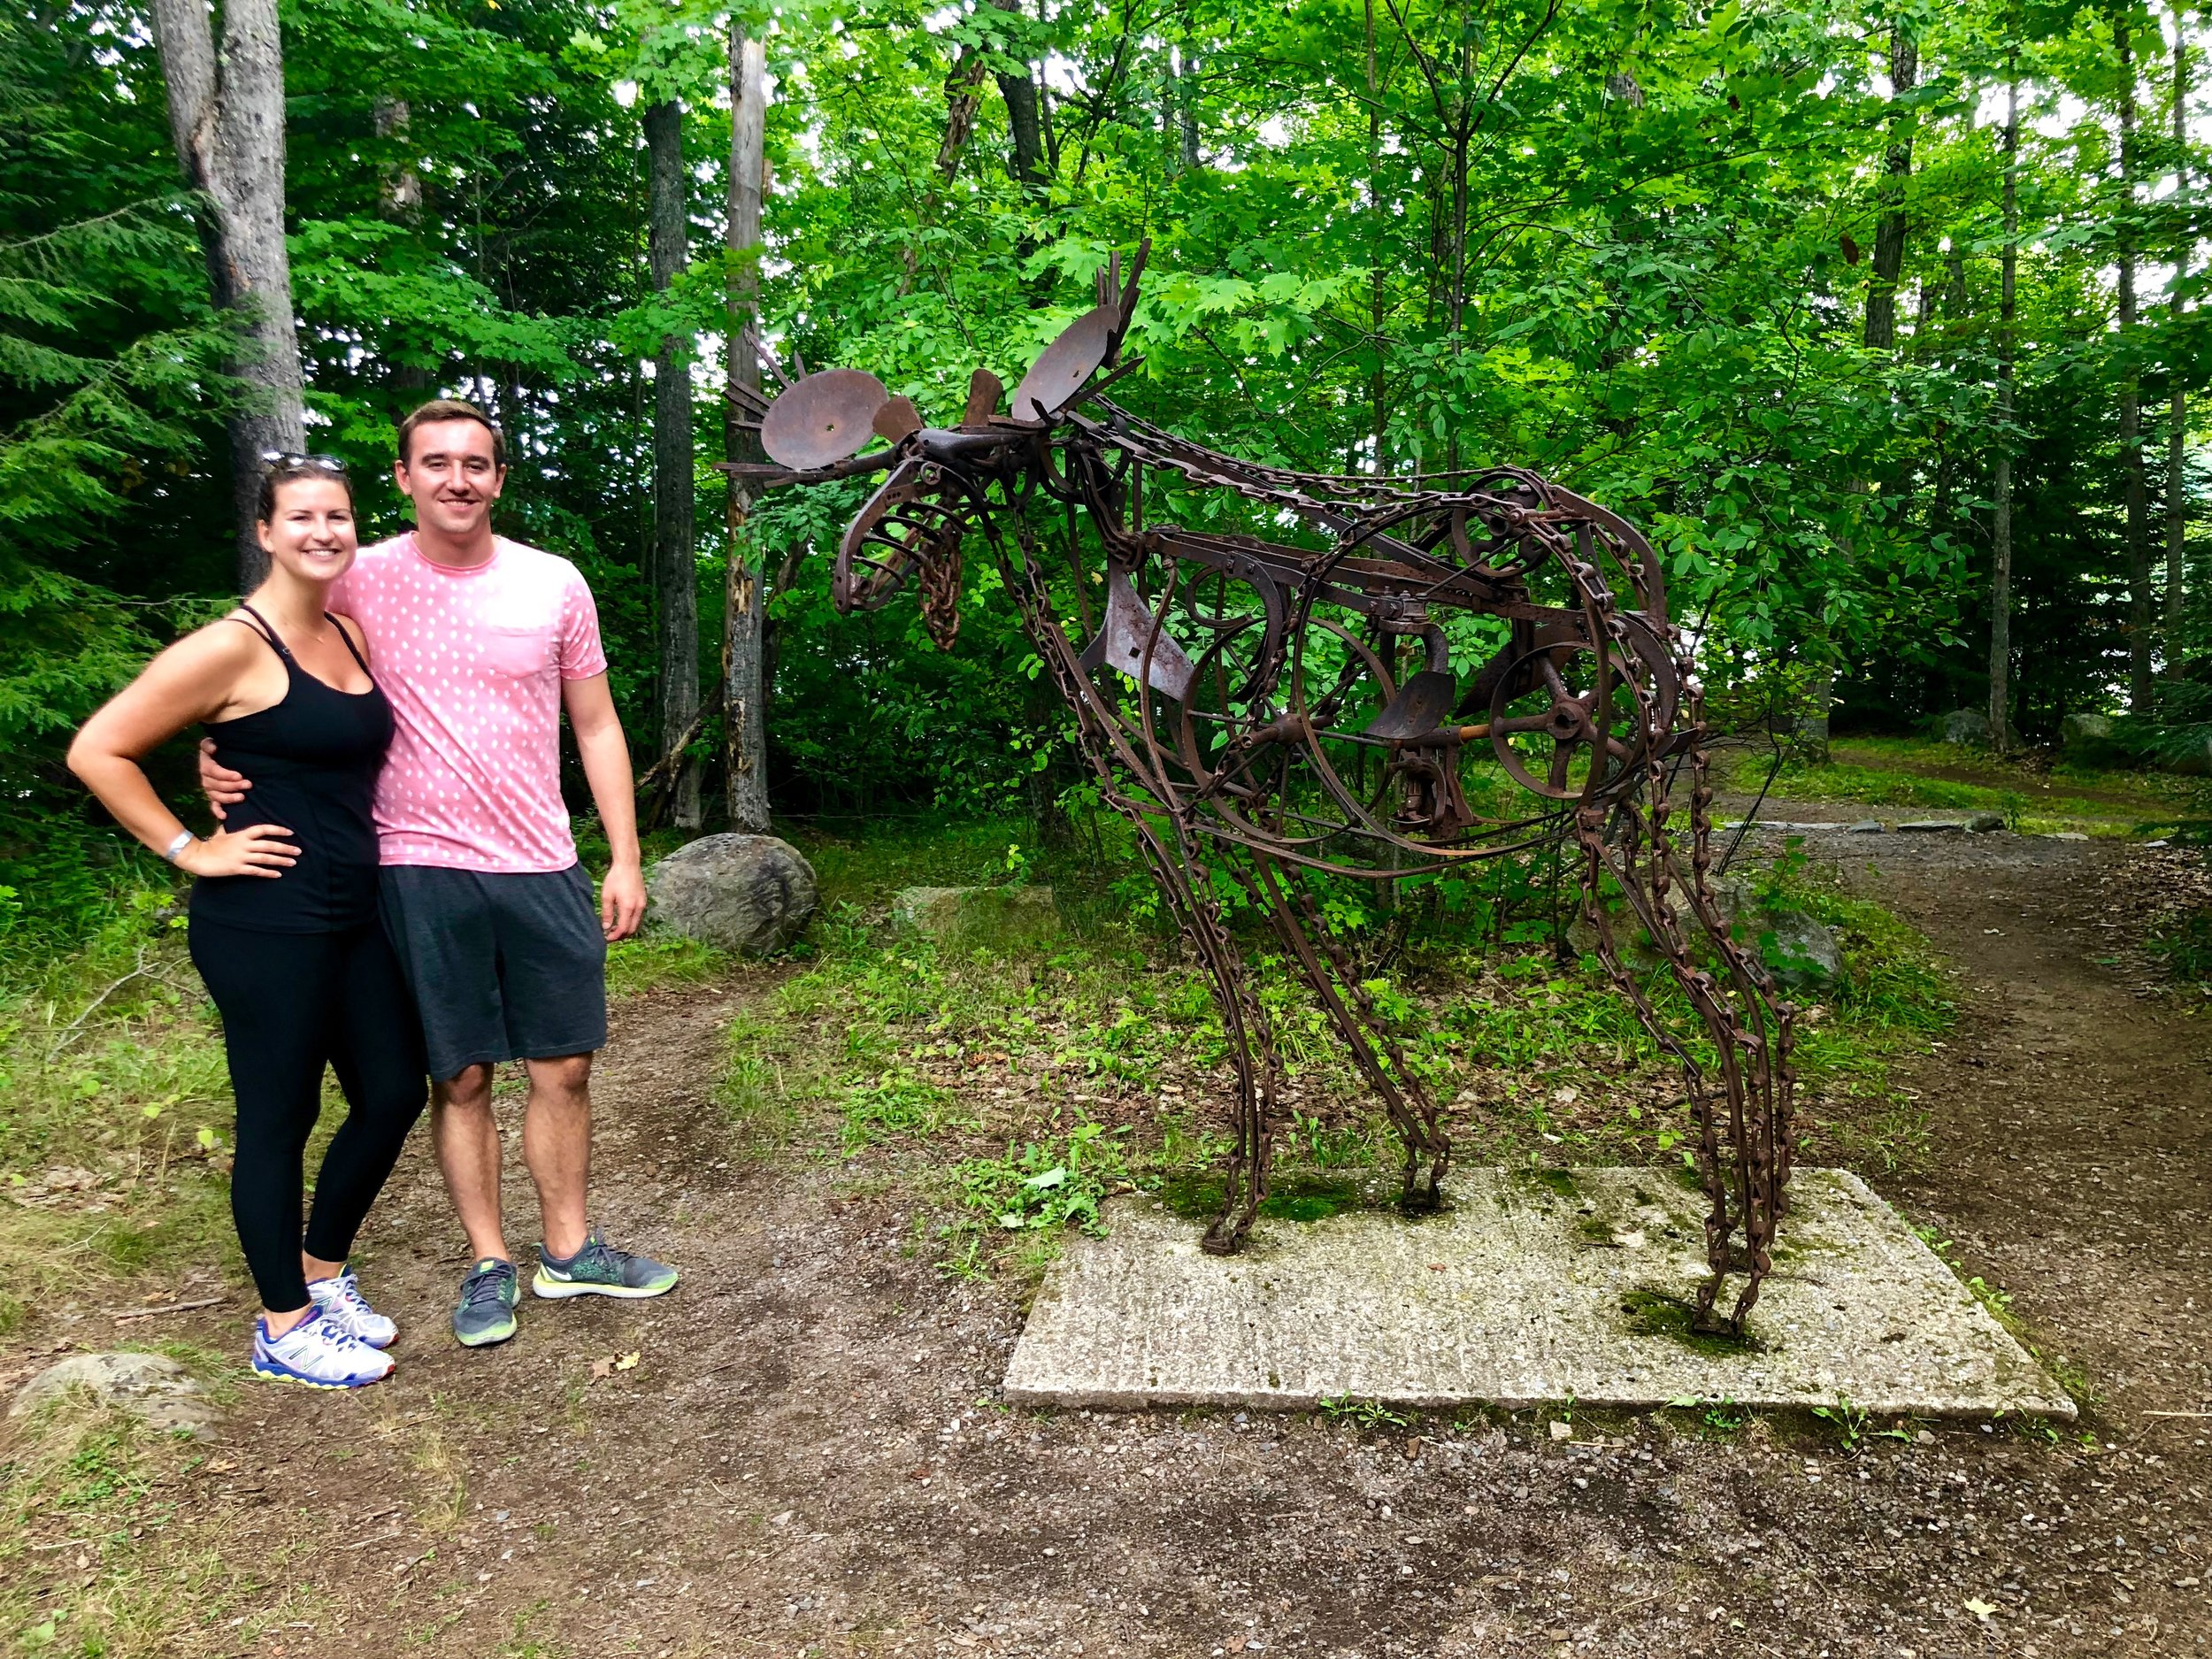 Haliburton Sculpture Forest in Glebe Park in Haliburton, Ontario